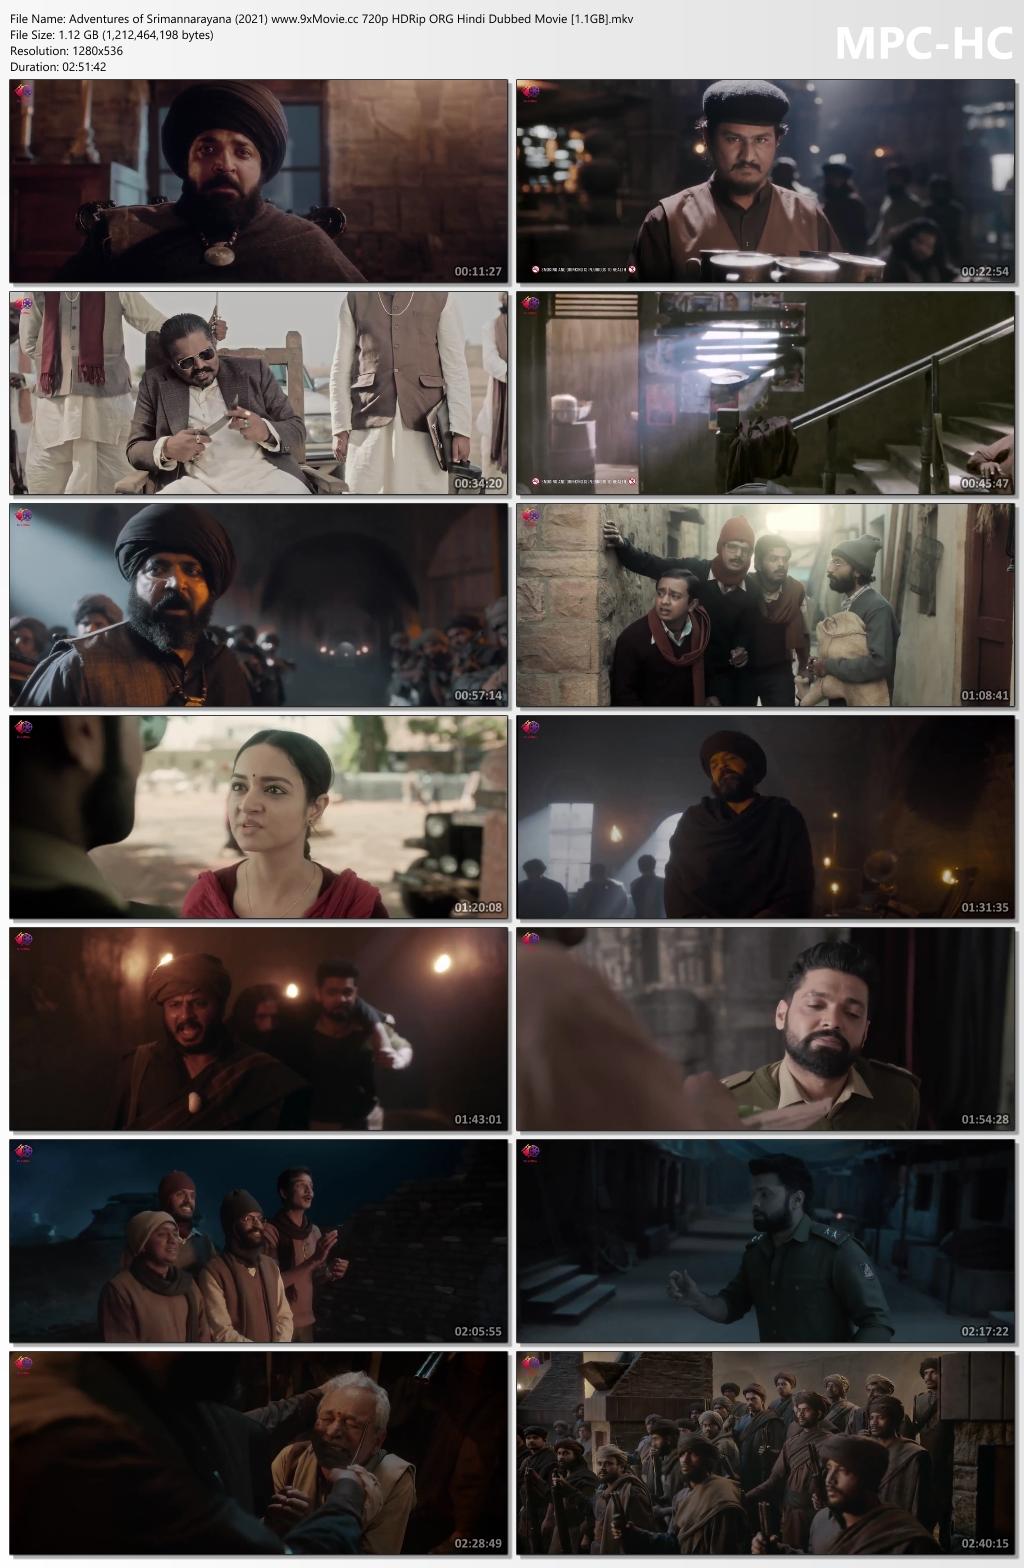 Adventures-of-Srimannarayana-2021-www-9x-Movie-cc-720p-HDRip-ORG-Hindi-Dubbed-Movie-1-1-GB-mkv